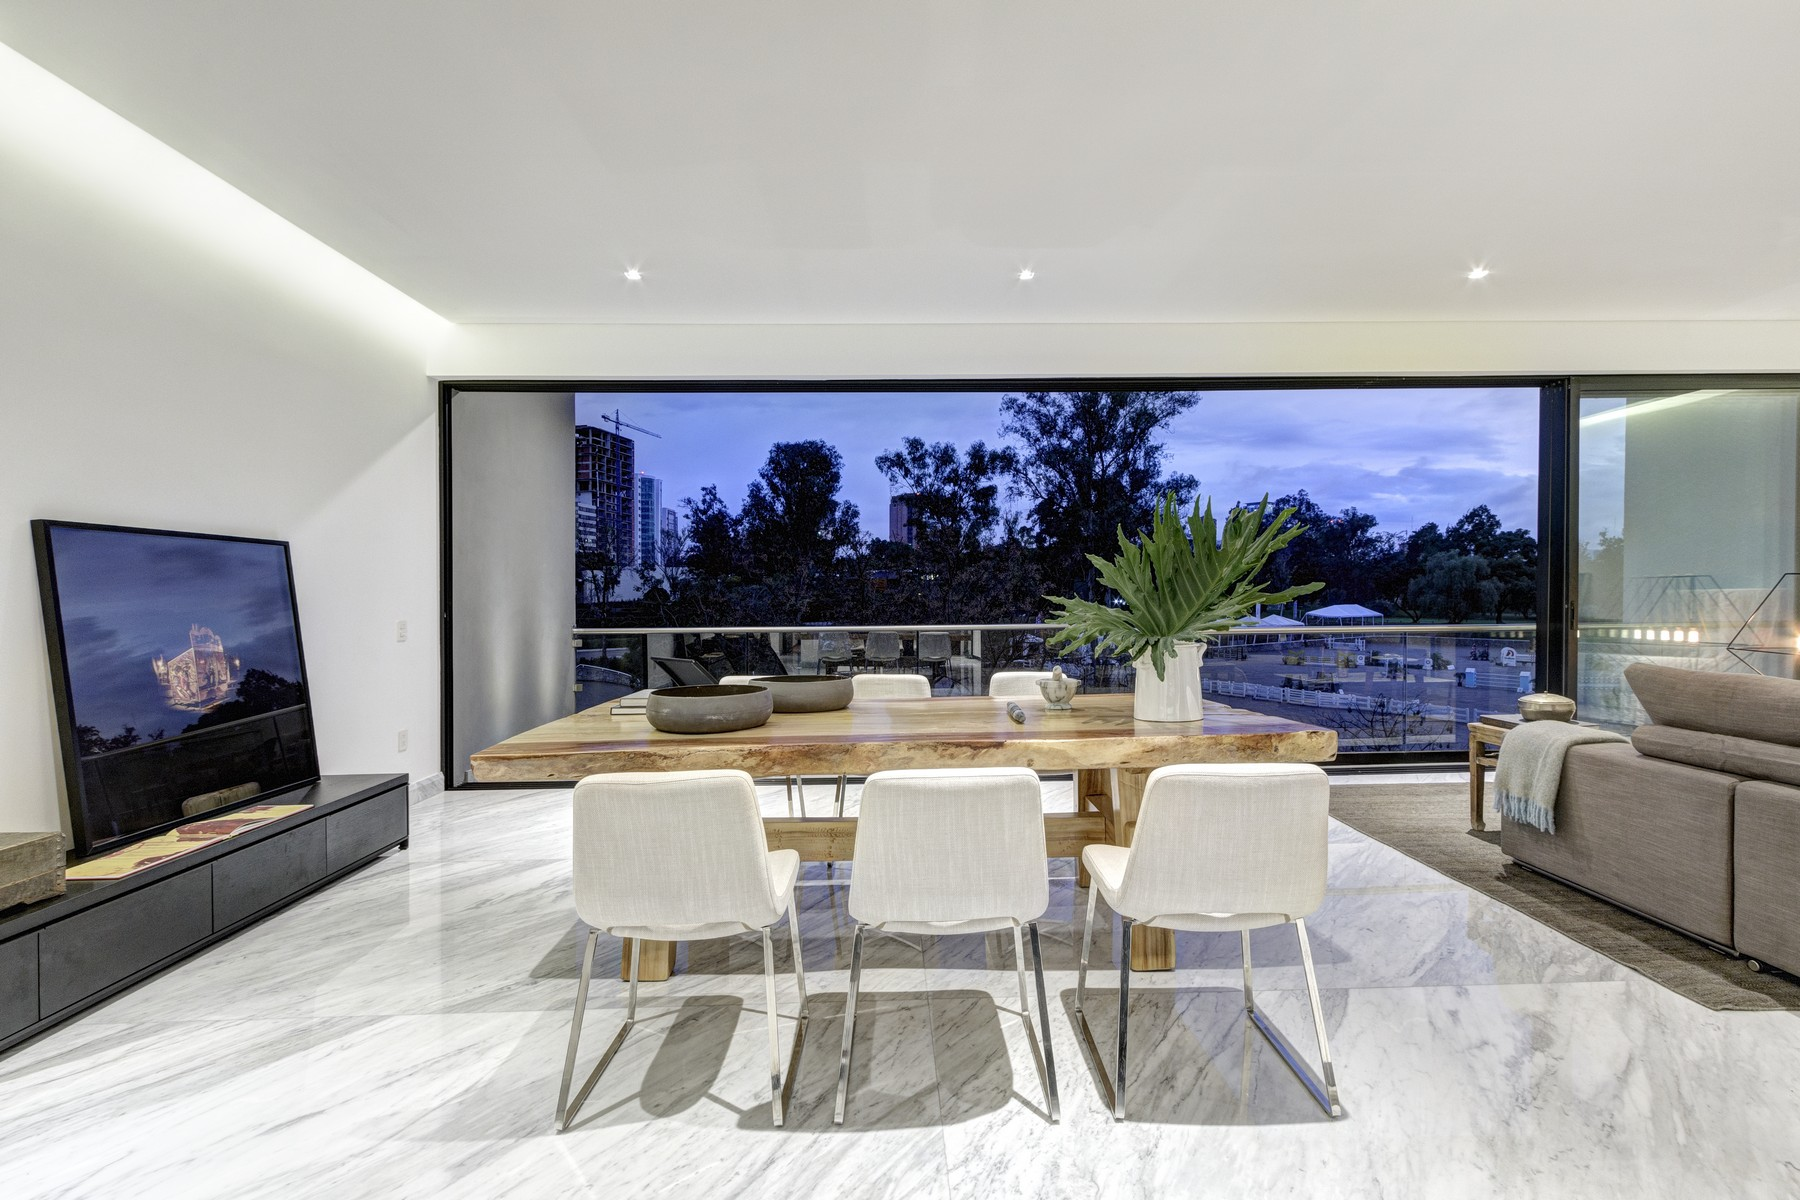 Additional photo for property listing at Torre Nuvo, Departamento 5 Av. Avila Camacho 2225 Guadalajara, Jalisco 22410 Mexico